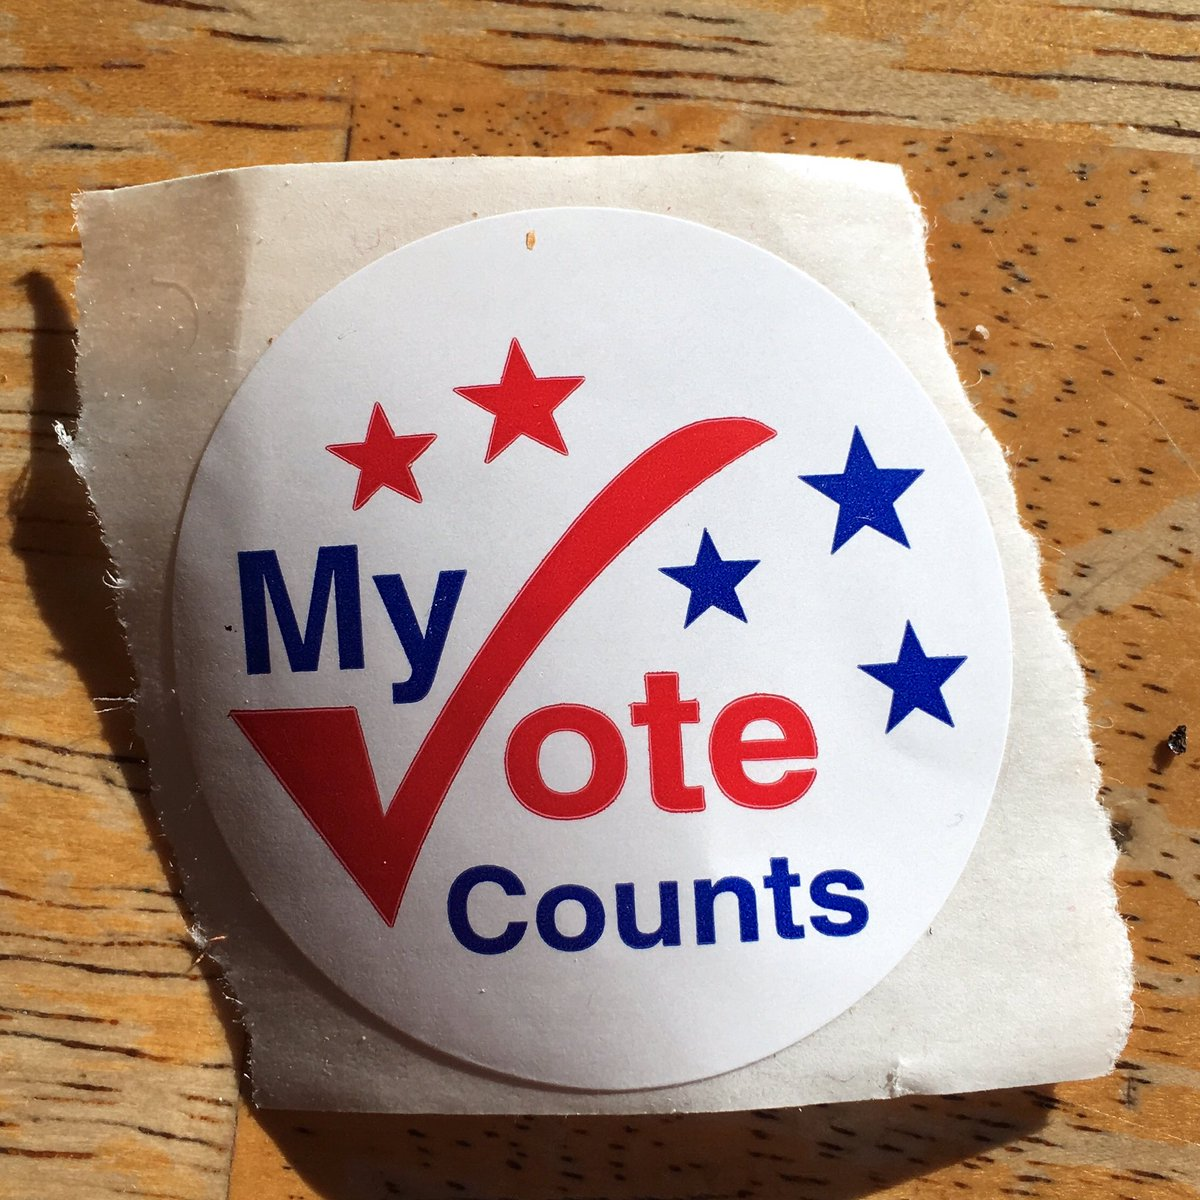 Just voted in democrat primary ballot here in #massachusetts #feelthebern Democracy is NOT a spectator sport #mapoli https://t.co/EVTnfhUwHG